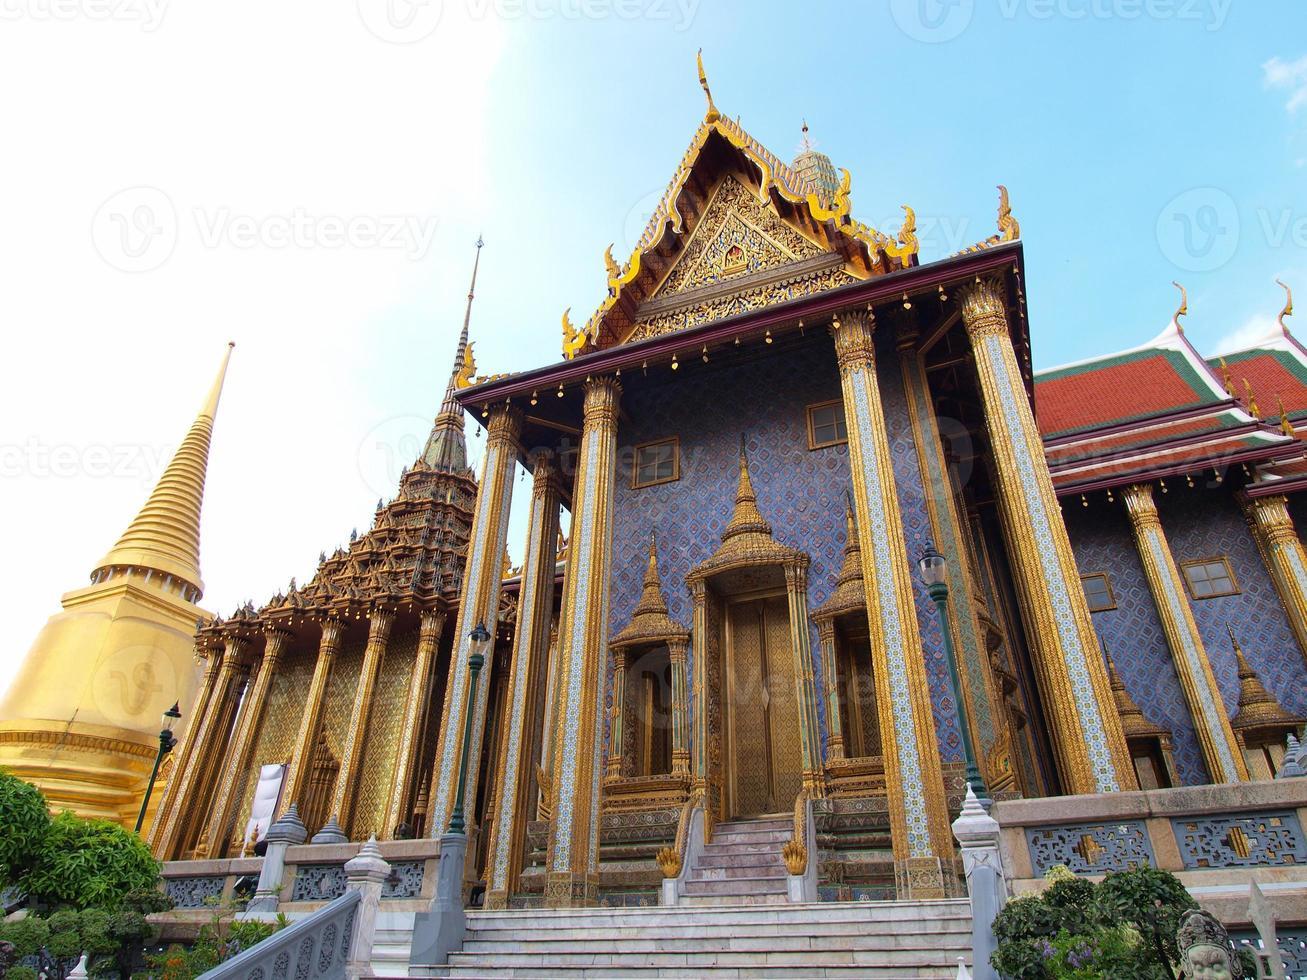 il grand palace di bangkok, thailandia. foto